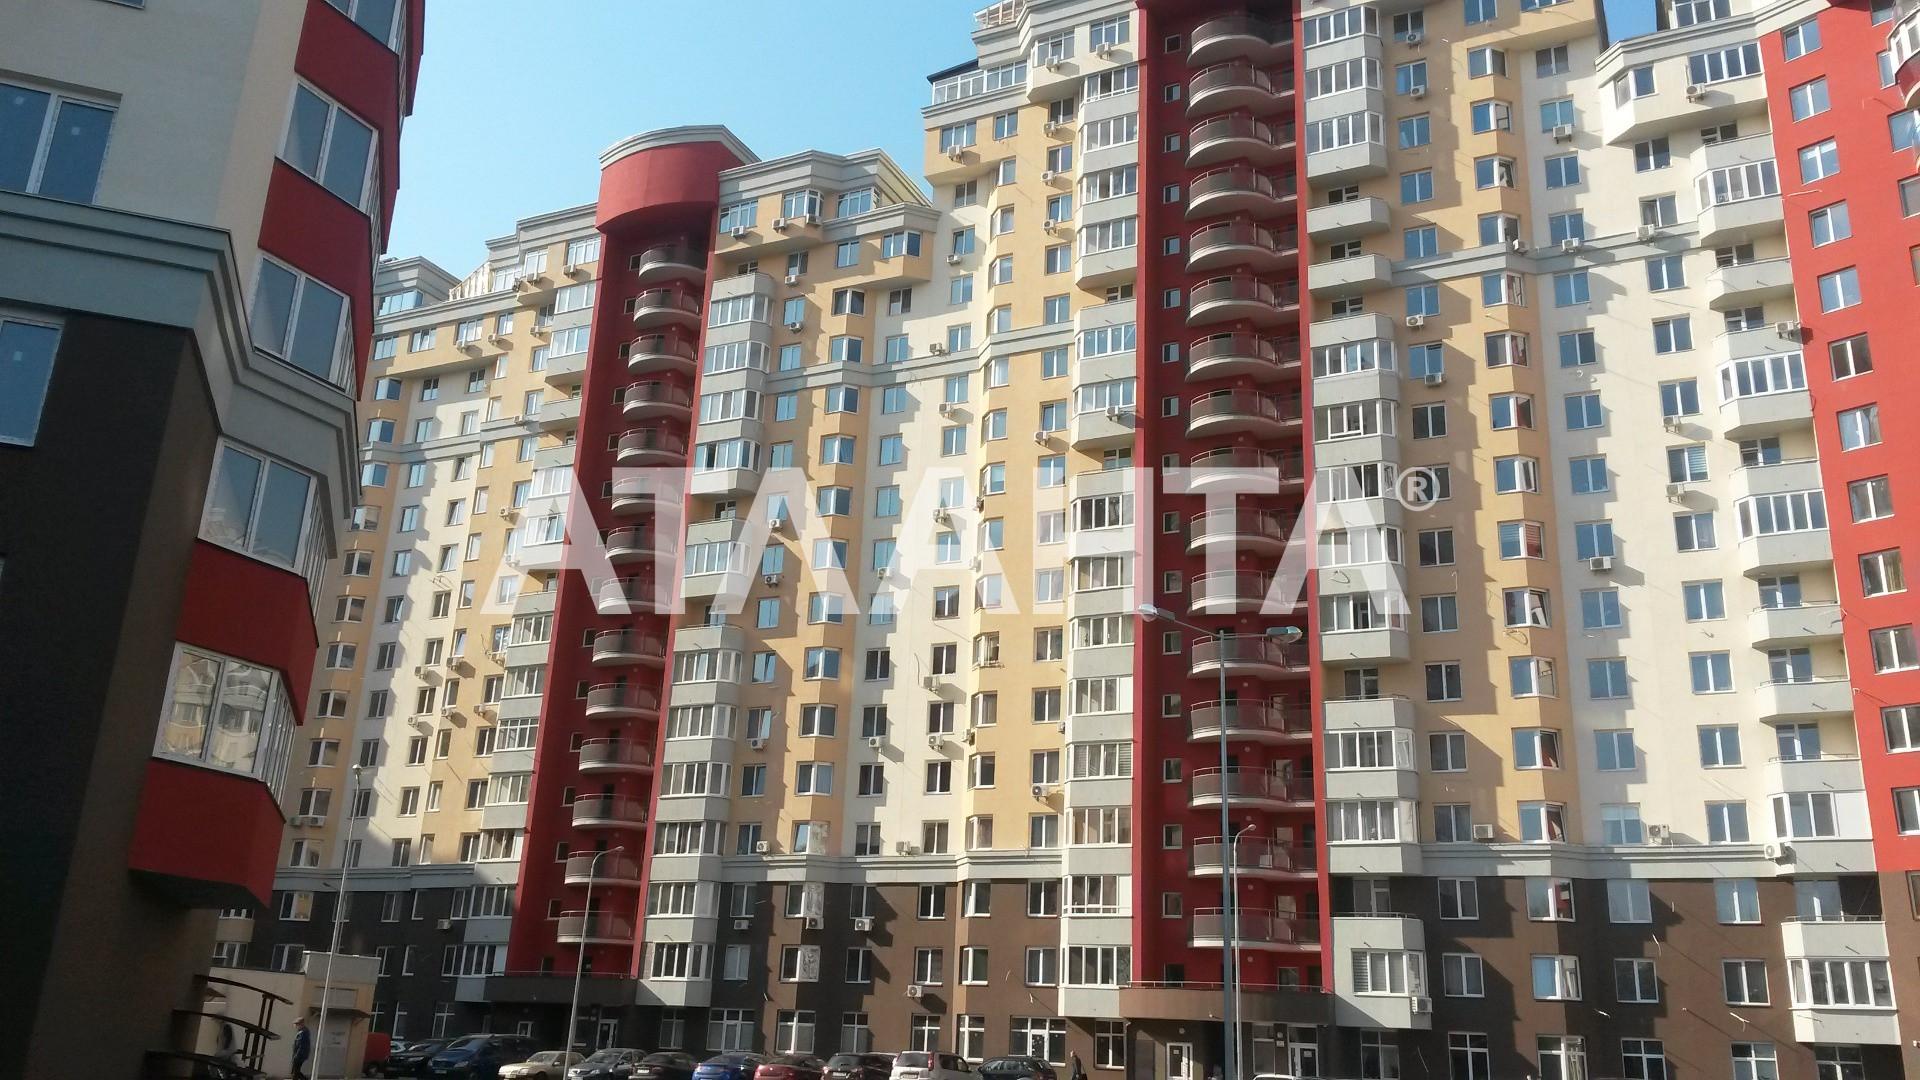 Продается 2-комнатная Квартира на ул. Ломоносова — 65 000 у.е. (фото №14)